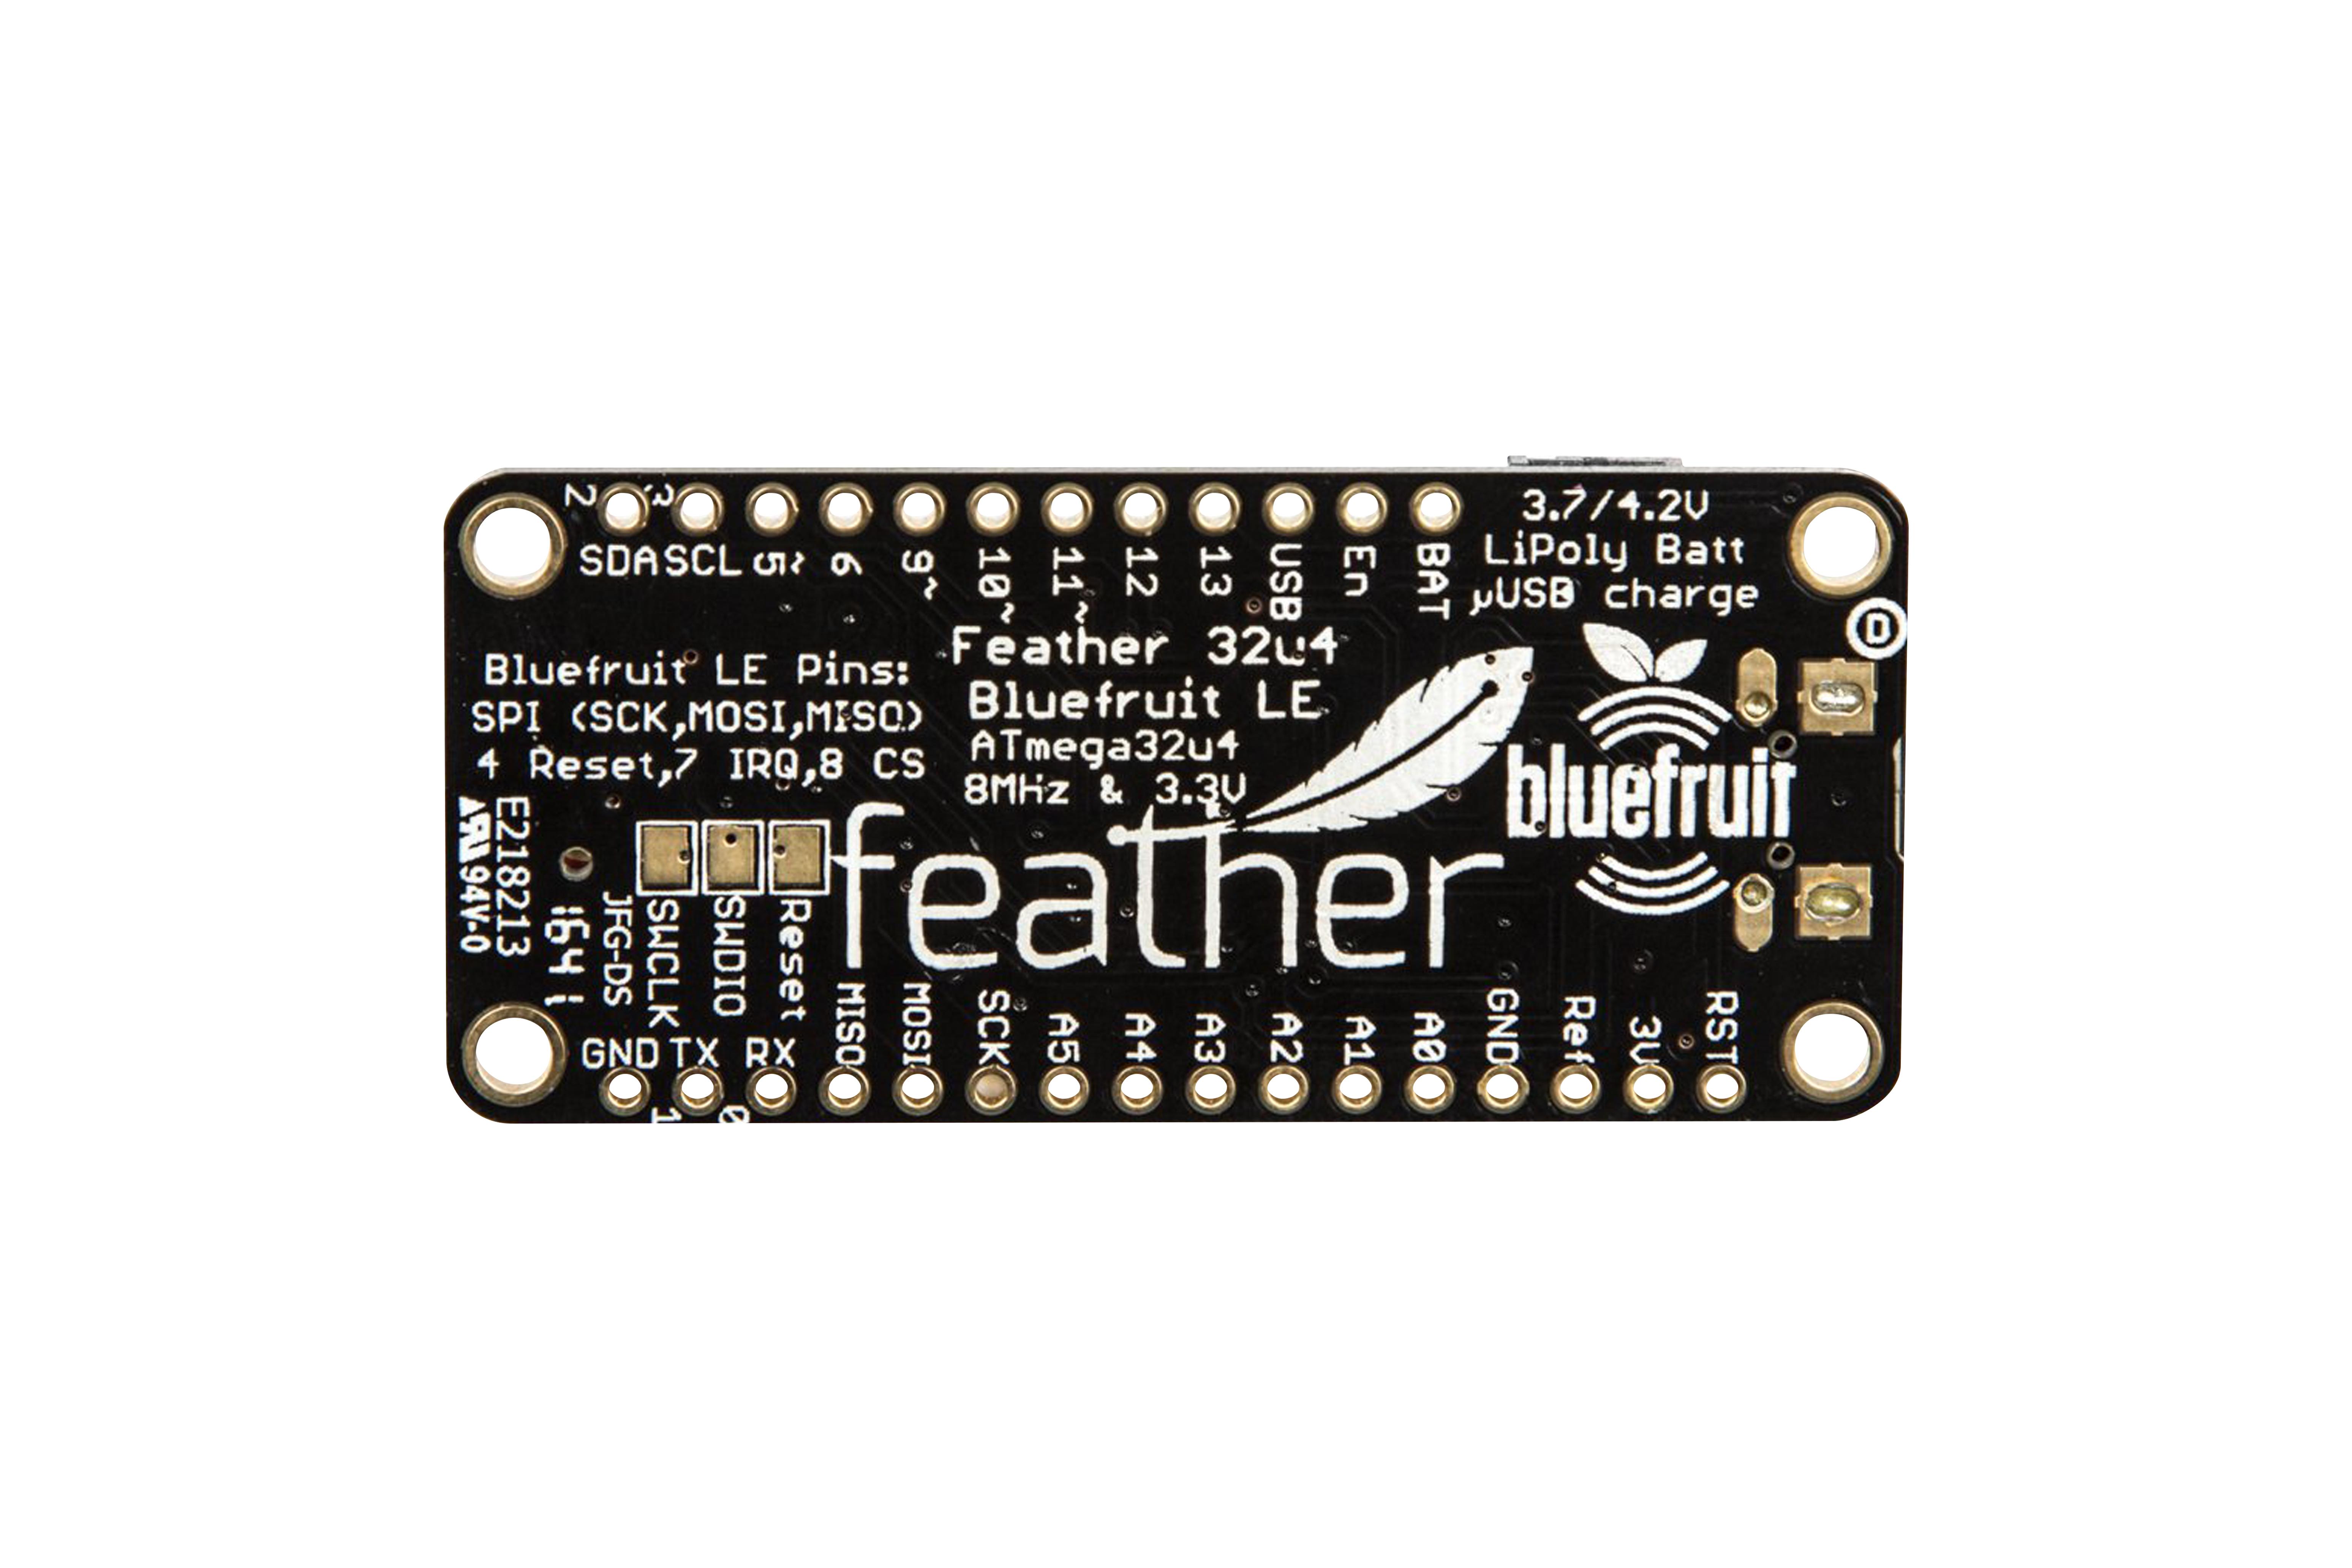 Adafruit Feather(アダフルーツ・フェザー)ATmega32u4 Bluefruit LE